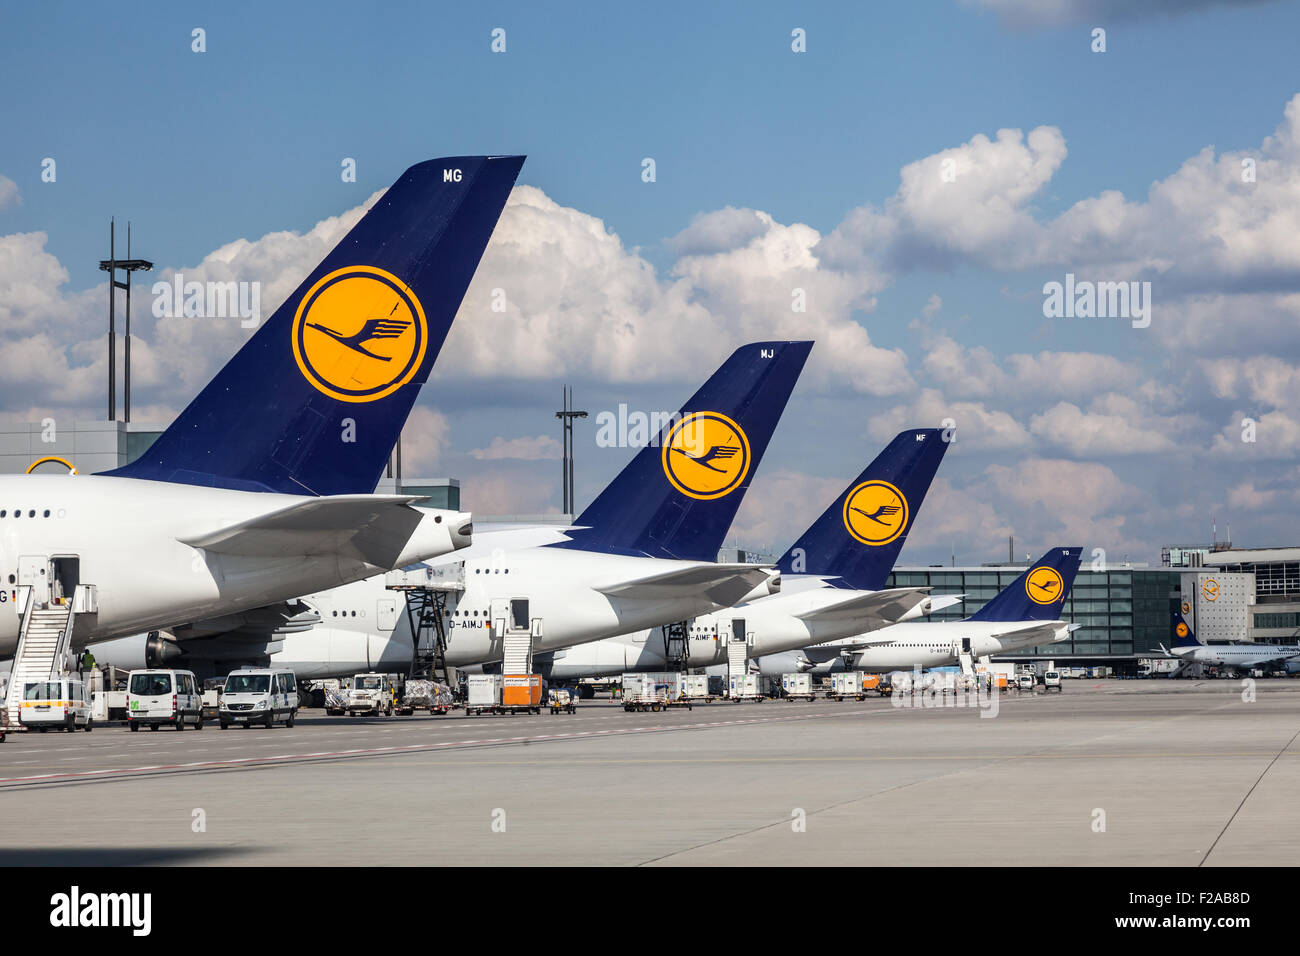 Lufthansa airplanes at the Frankfurt Airport - Stock Image